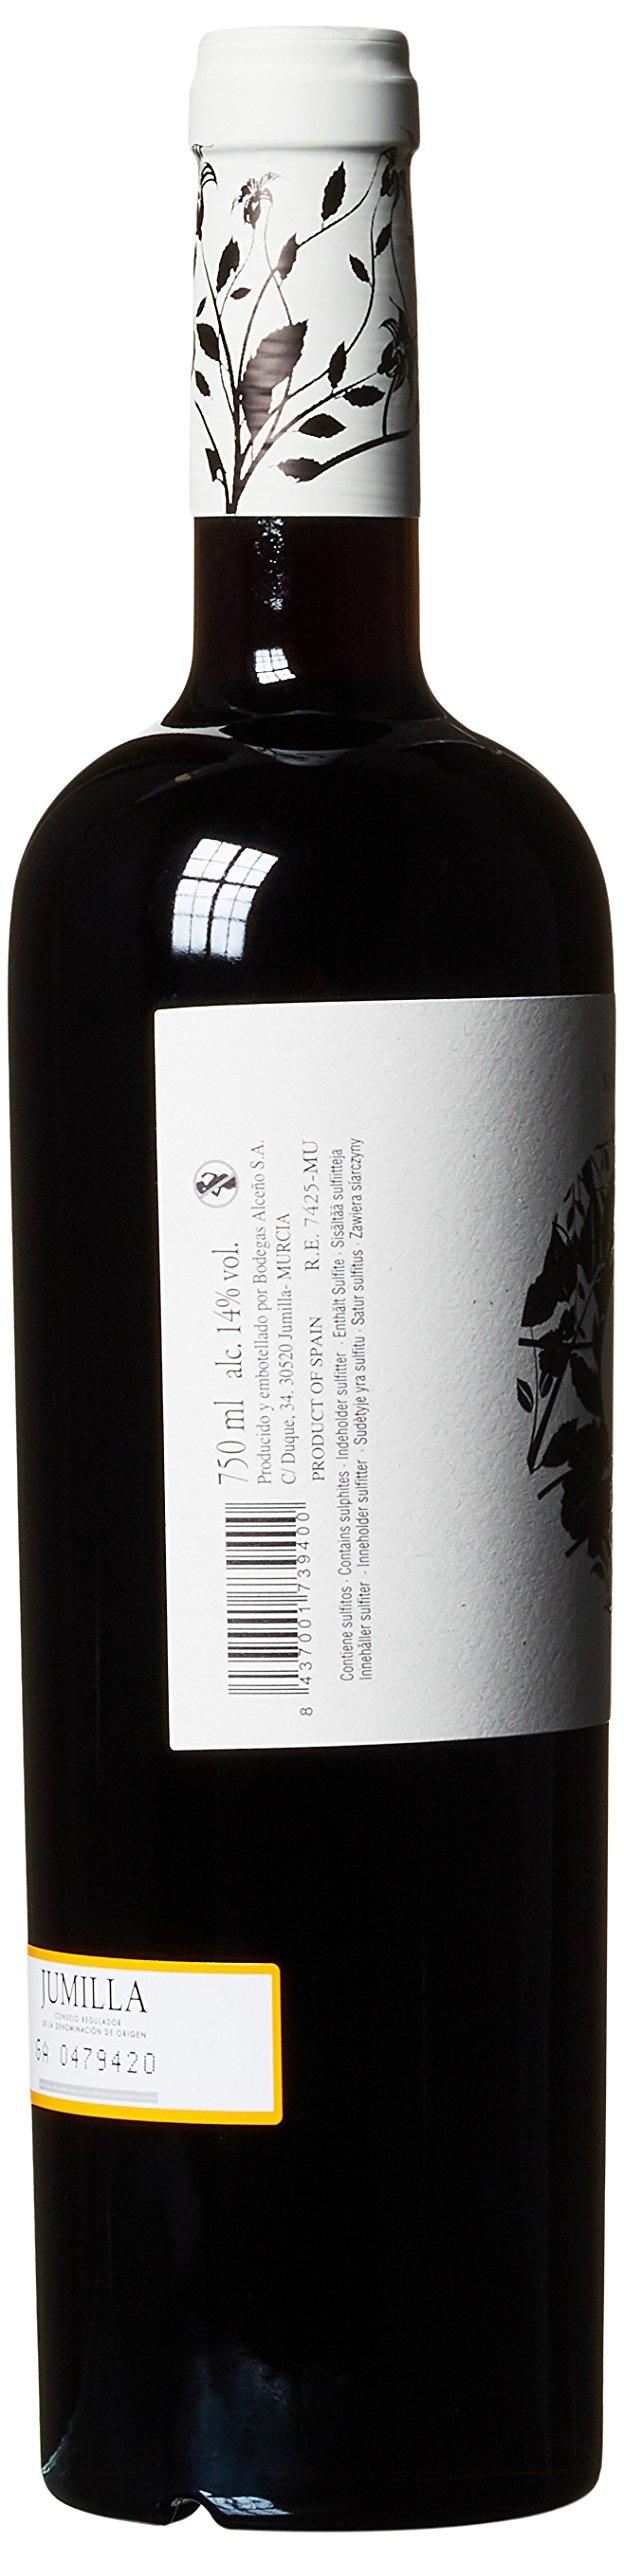 Alceo-Organic-DOP-Cuve-2014-Trocken-1-x-075-l